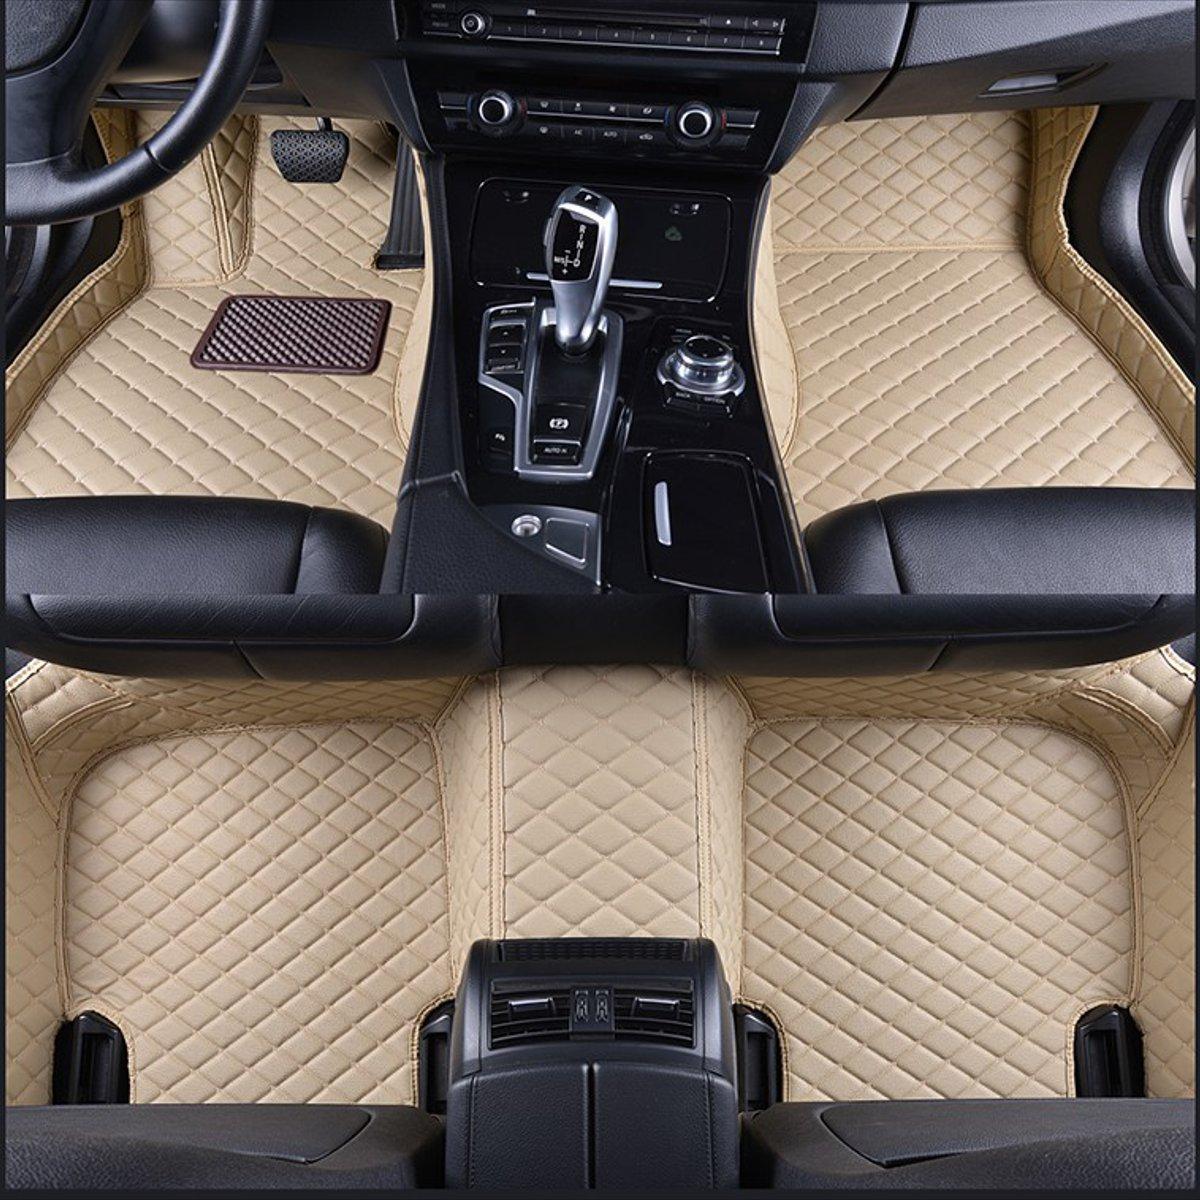 PVC Cubeta Maletero Nissan Qashqai - 5 plazas 2010-2014 Rey Alfombrillas/®